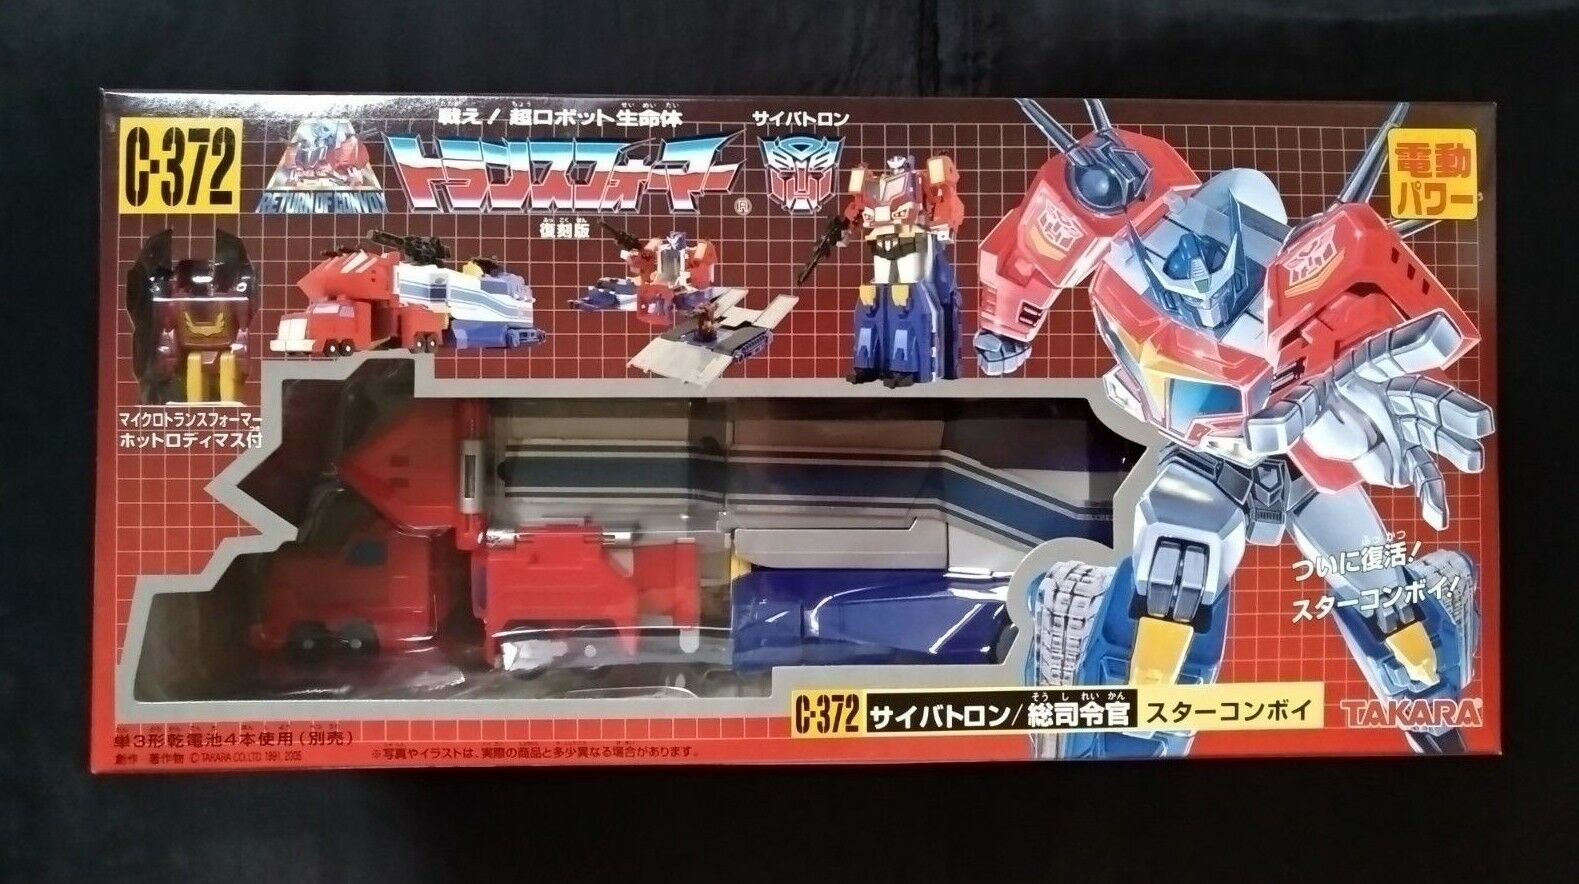 Transformers Estrella Convoy C-372 Takara Optimus Rodimus Autobot Anime Manga